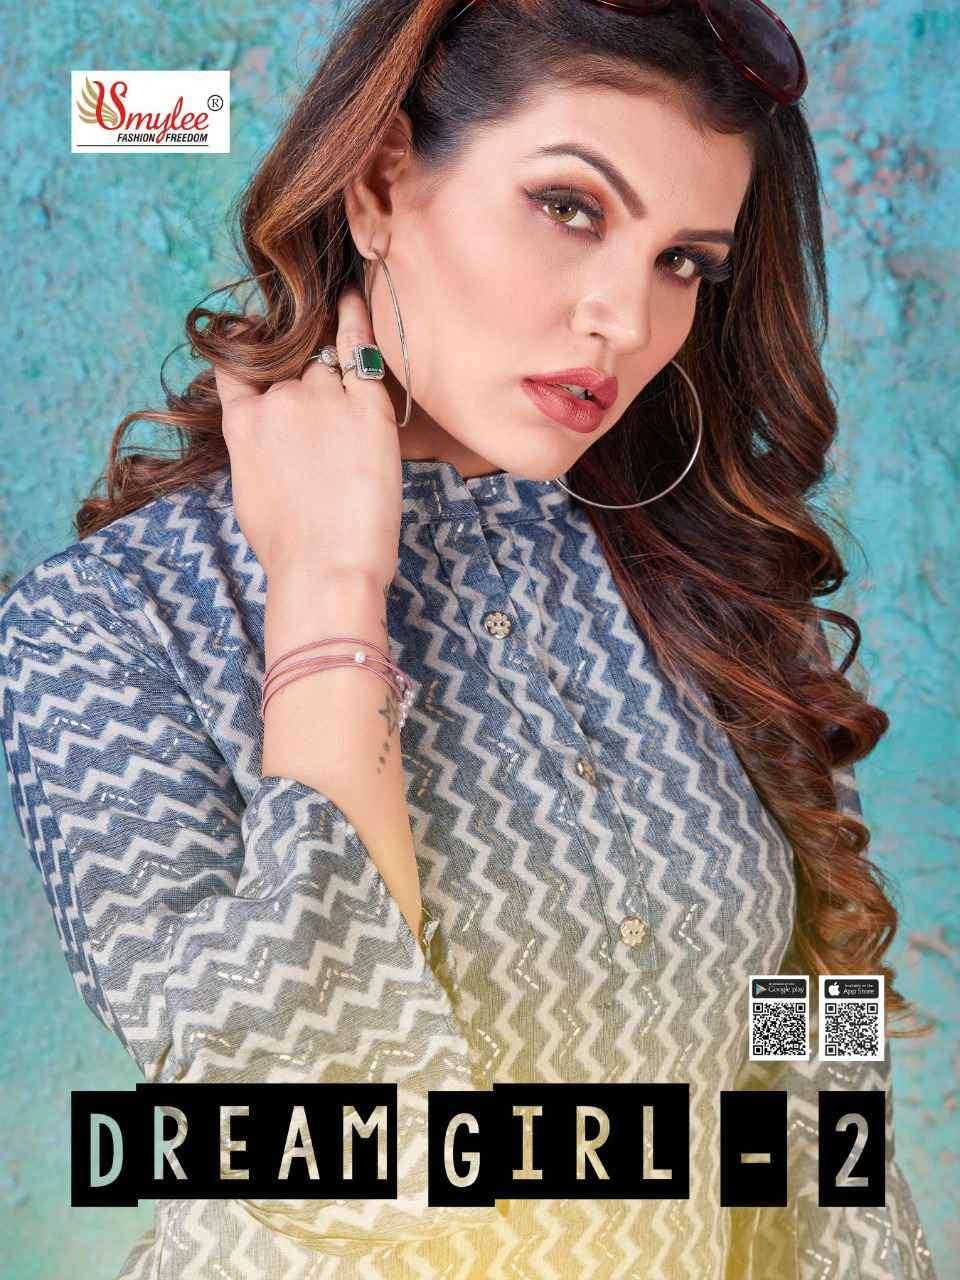 Rung Dream Girl Vol 2 Printed Rayon Short top catalog Wholesaler